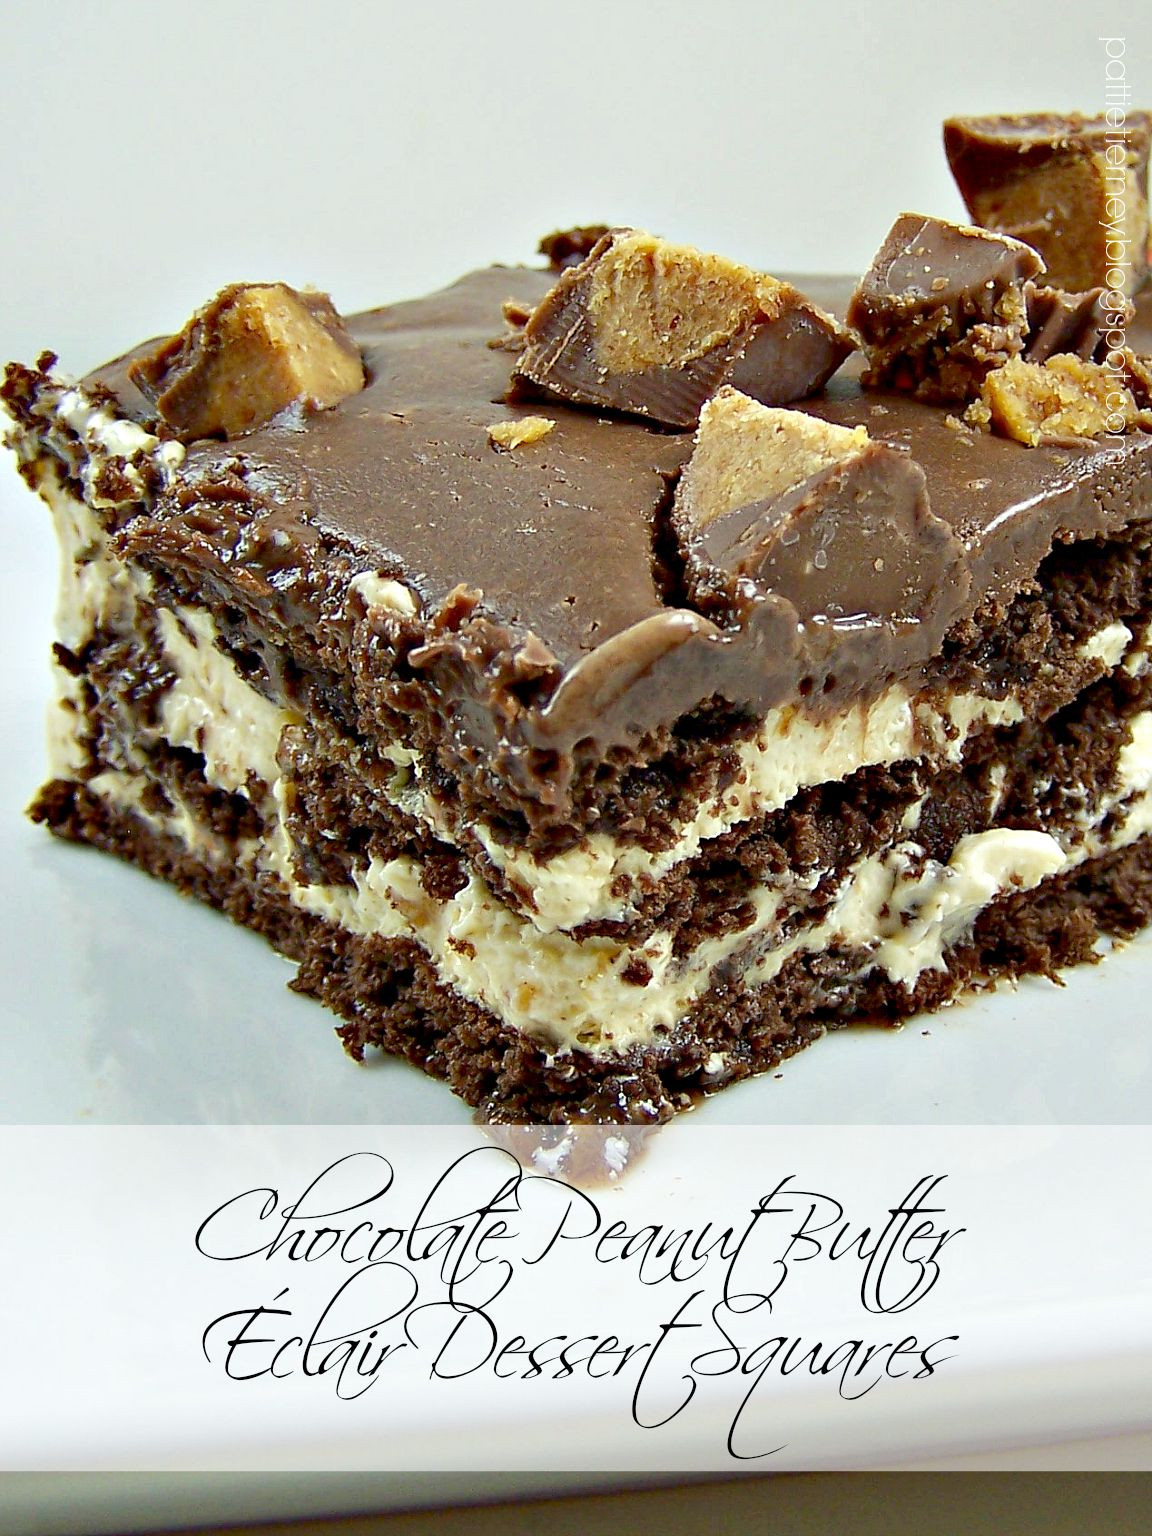 Chocolate Peanut Butter Dessert  Olla Podrida Chocolate Peanut Butter Éclair Dessert Squares